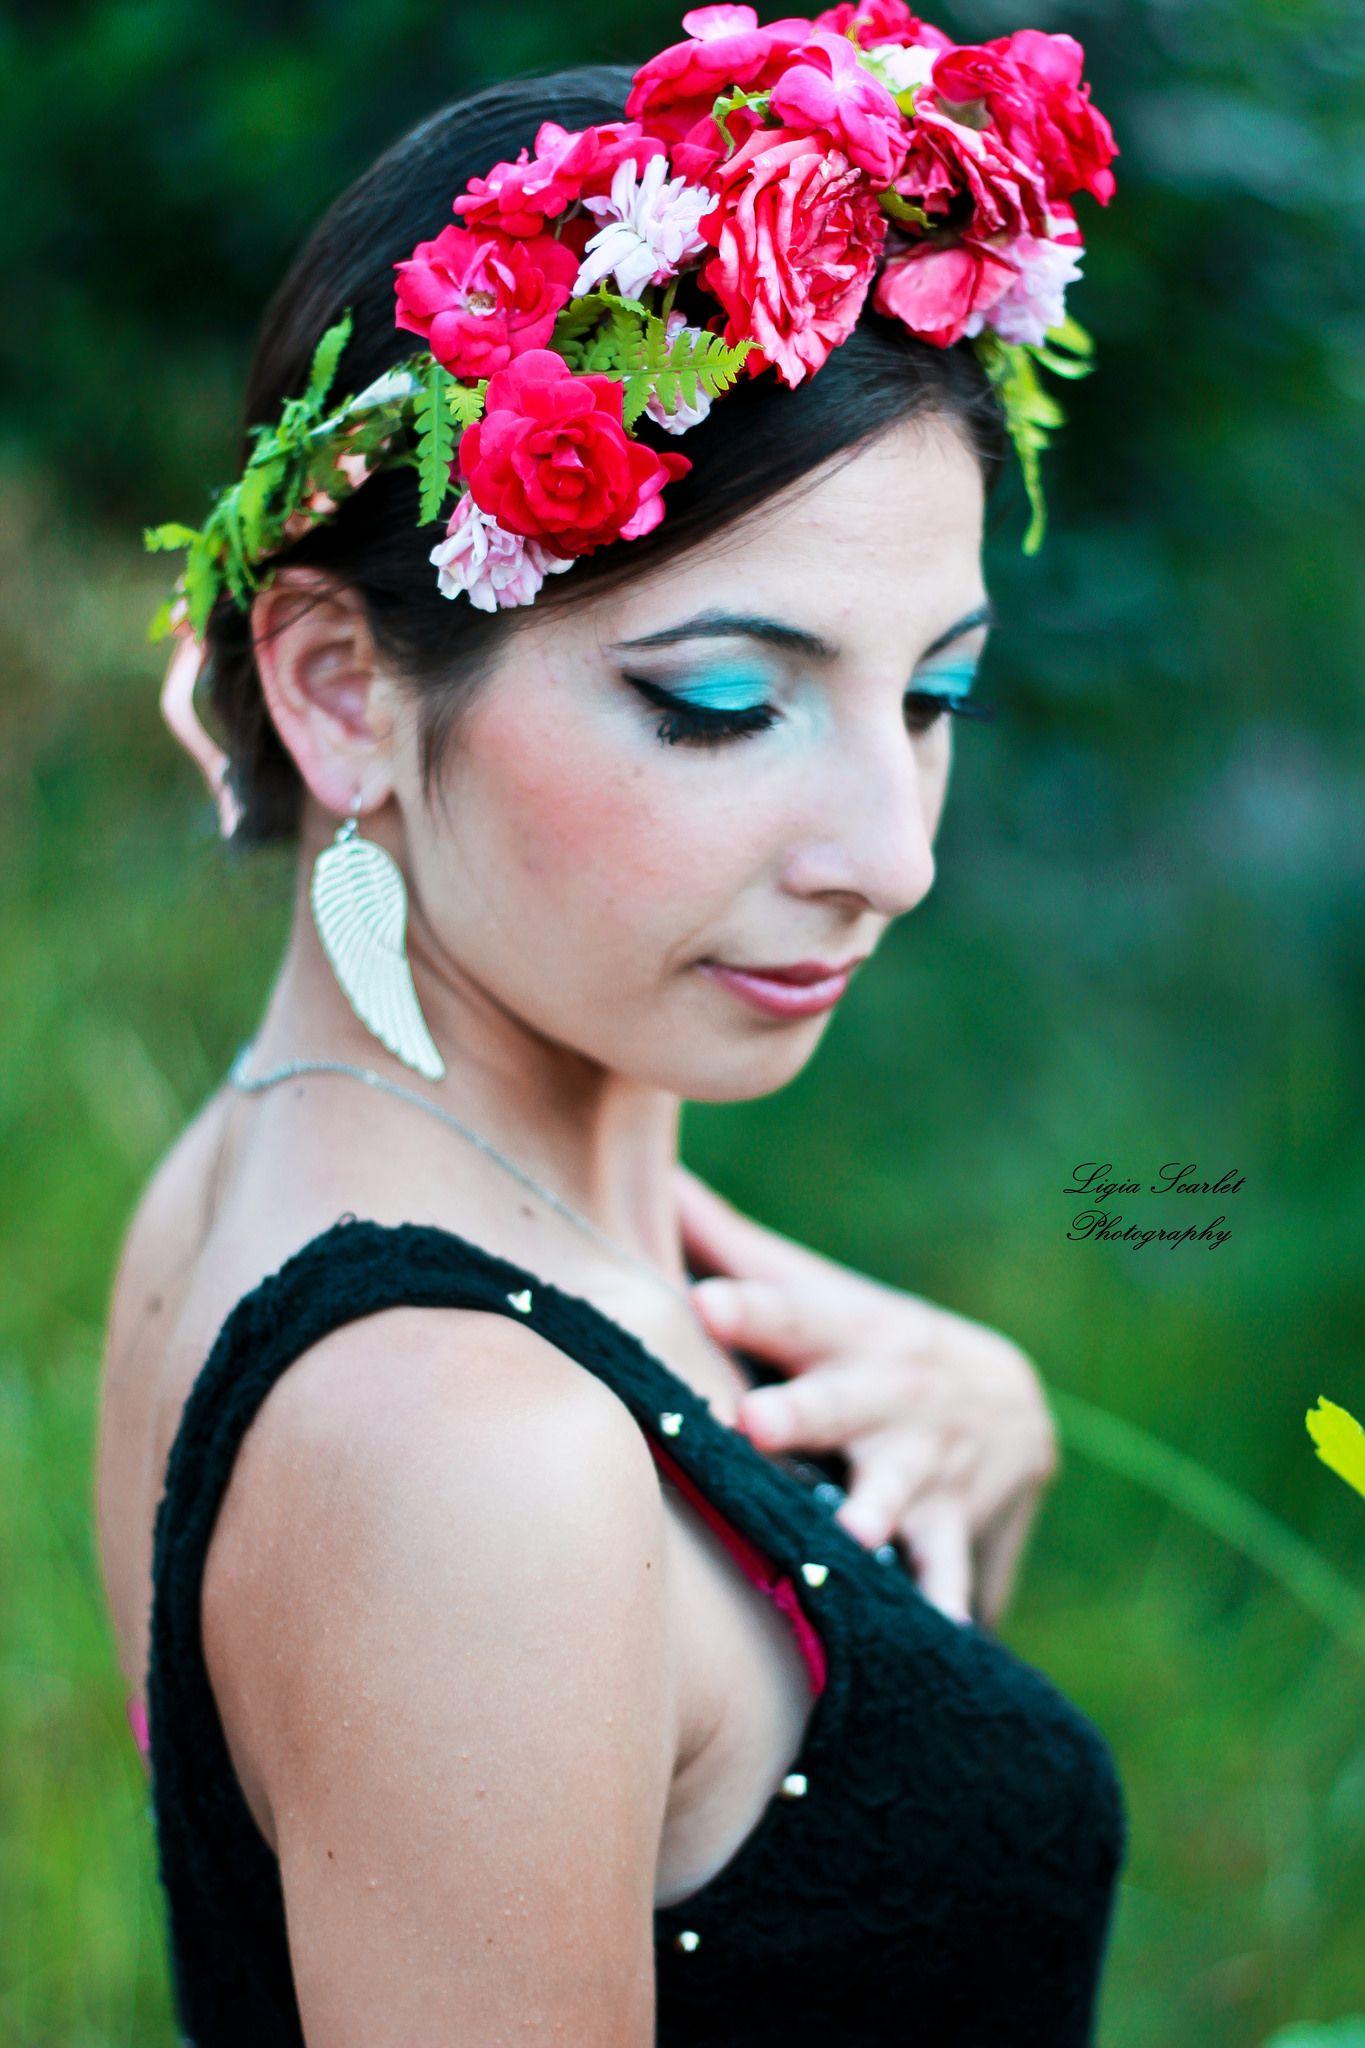 Flower crown pinterest flower crowns scarlet and crown httpsflicpyifs2n flower crown model izmirmasajfo